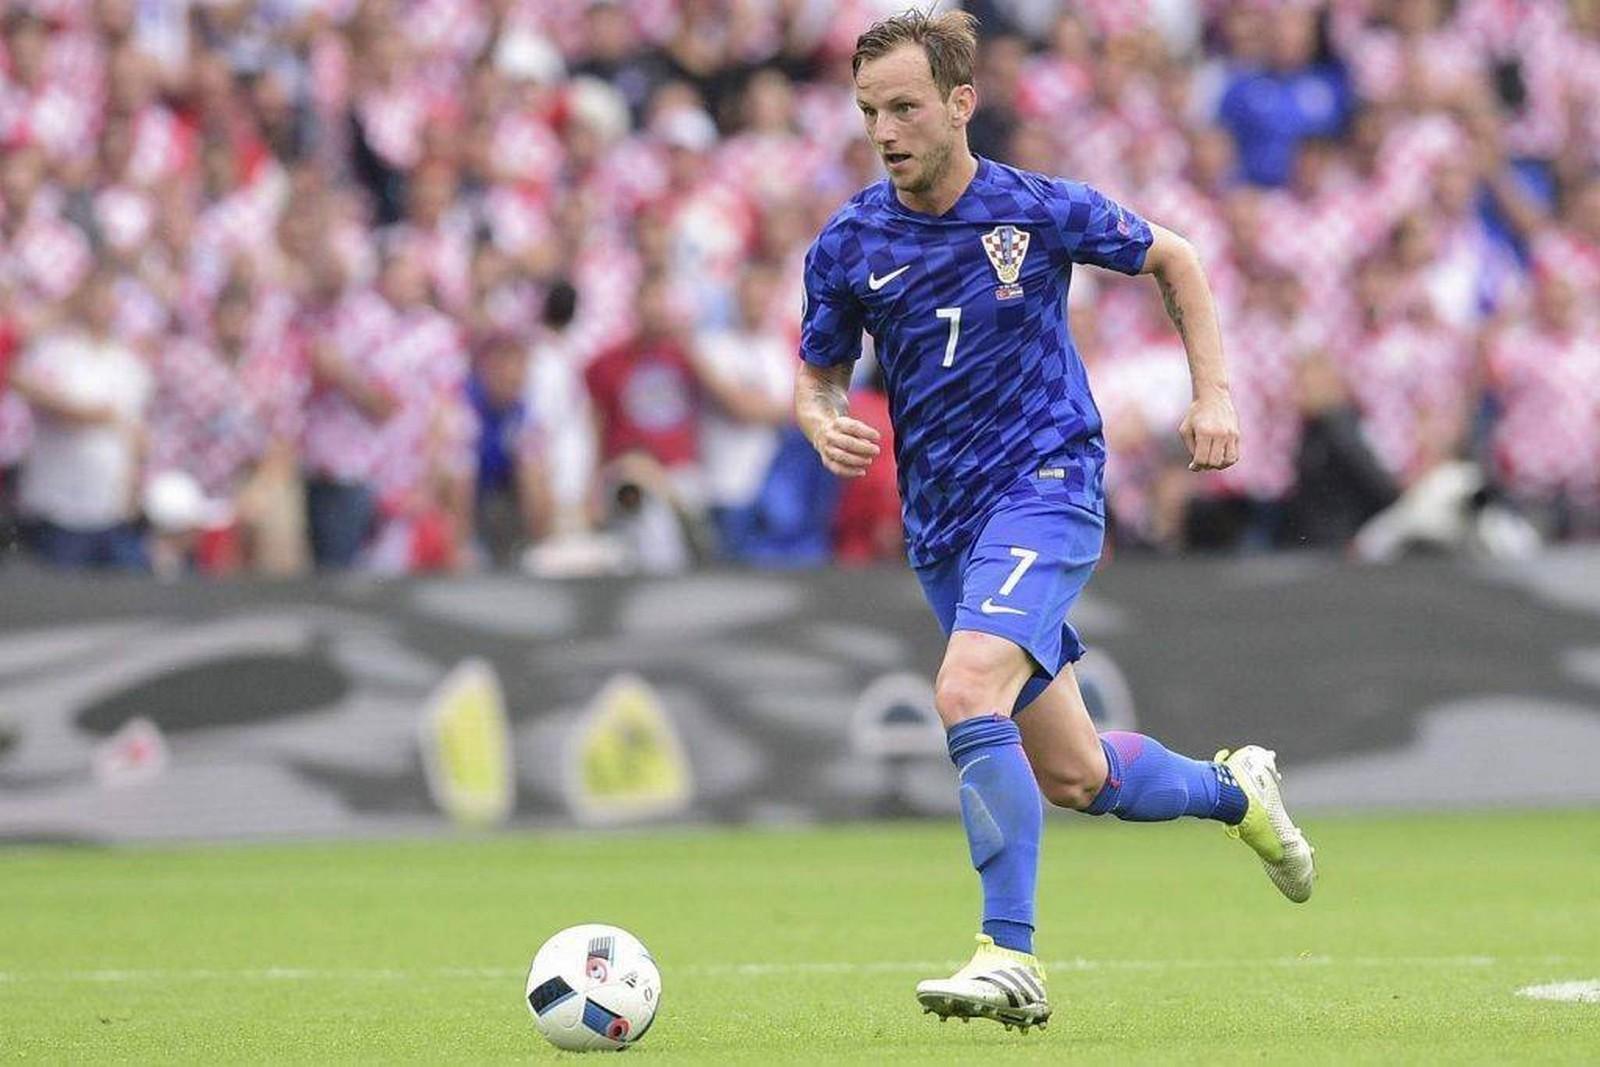 Holt Ivan Rakitic den dritten Sieg mit Kroatien? Jetzt auf island gegen Kroatien wetten!